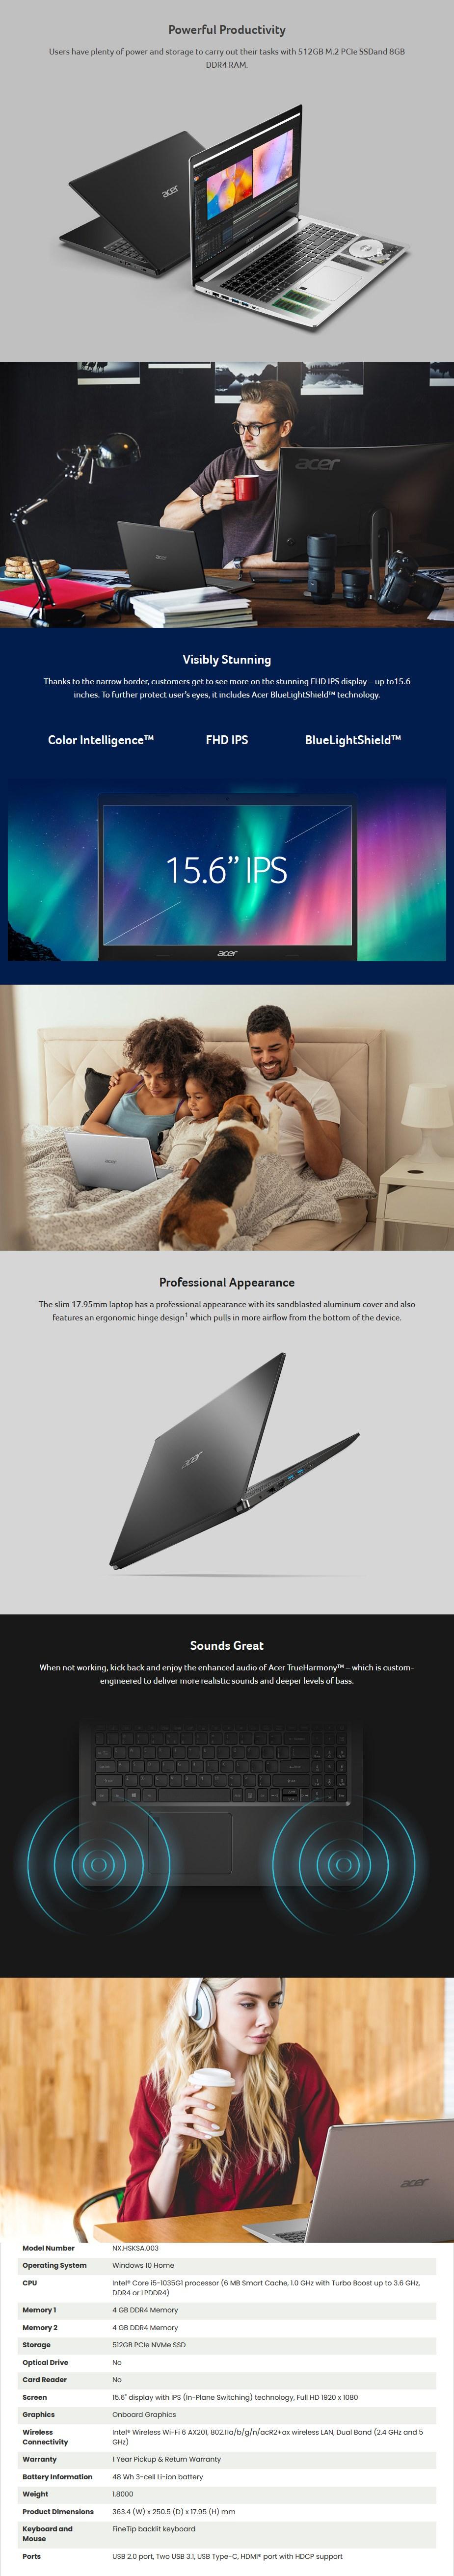 acer-aspire-5-156-laptop-i51035g1-8gb-512gb-win10-home-ac37222-5.jpg